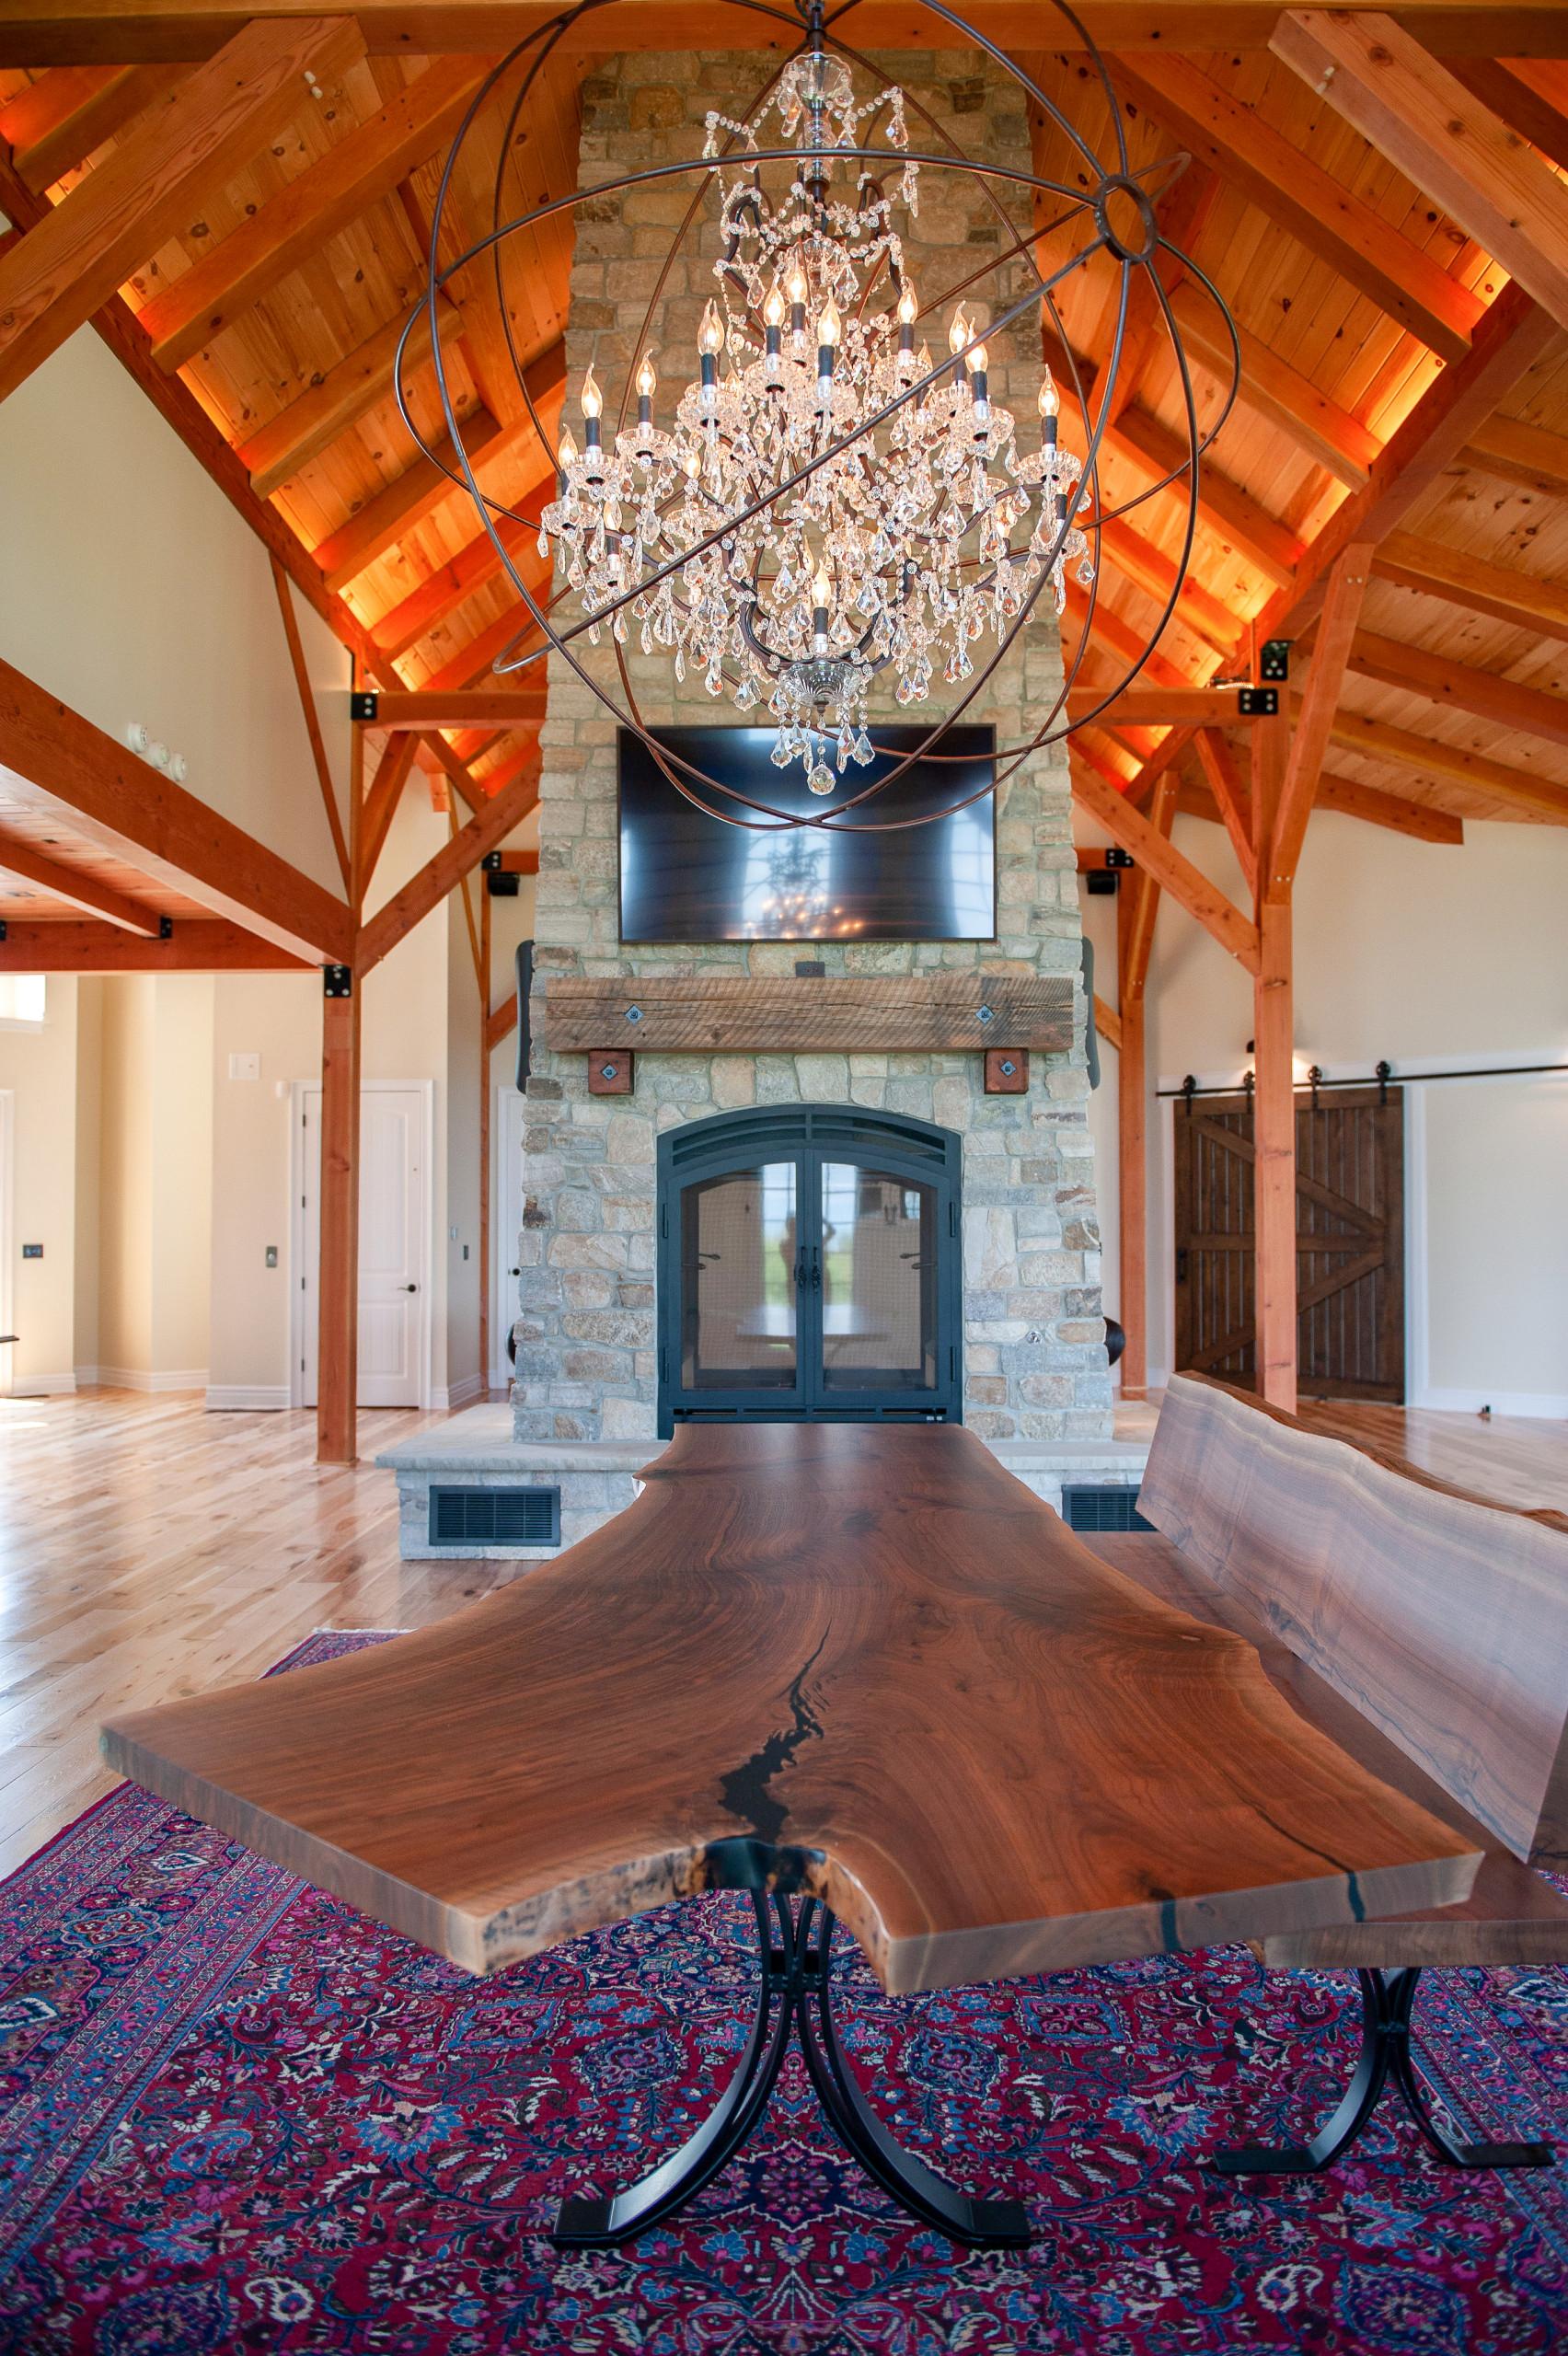 Addition: Solomon Estates Timber frame